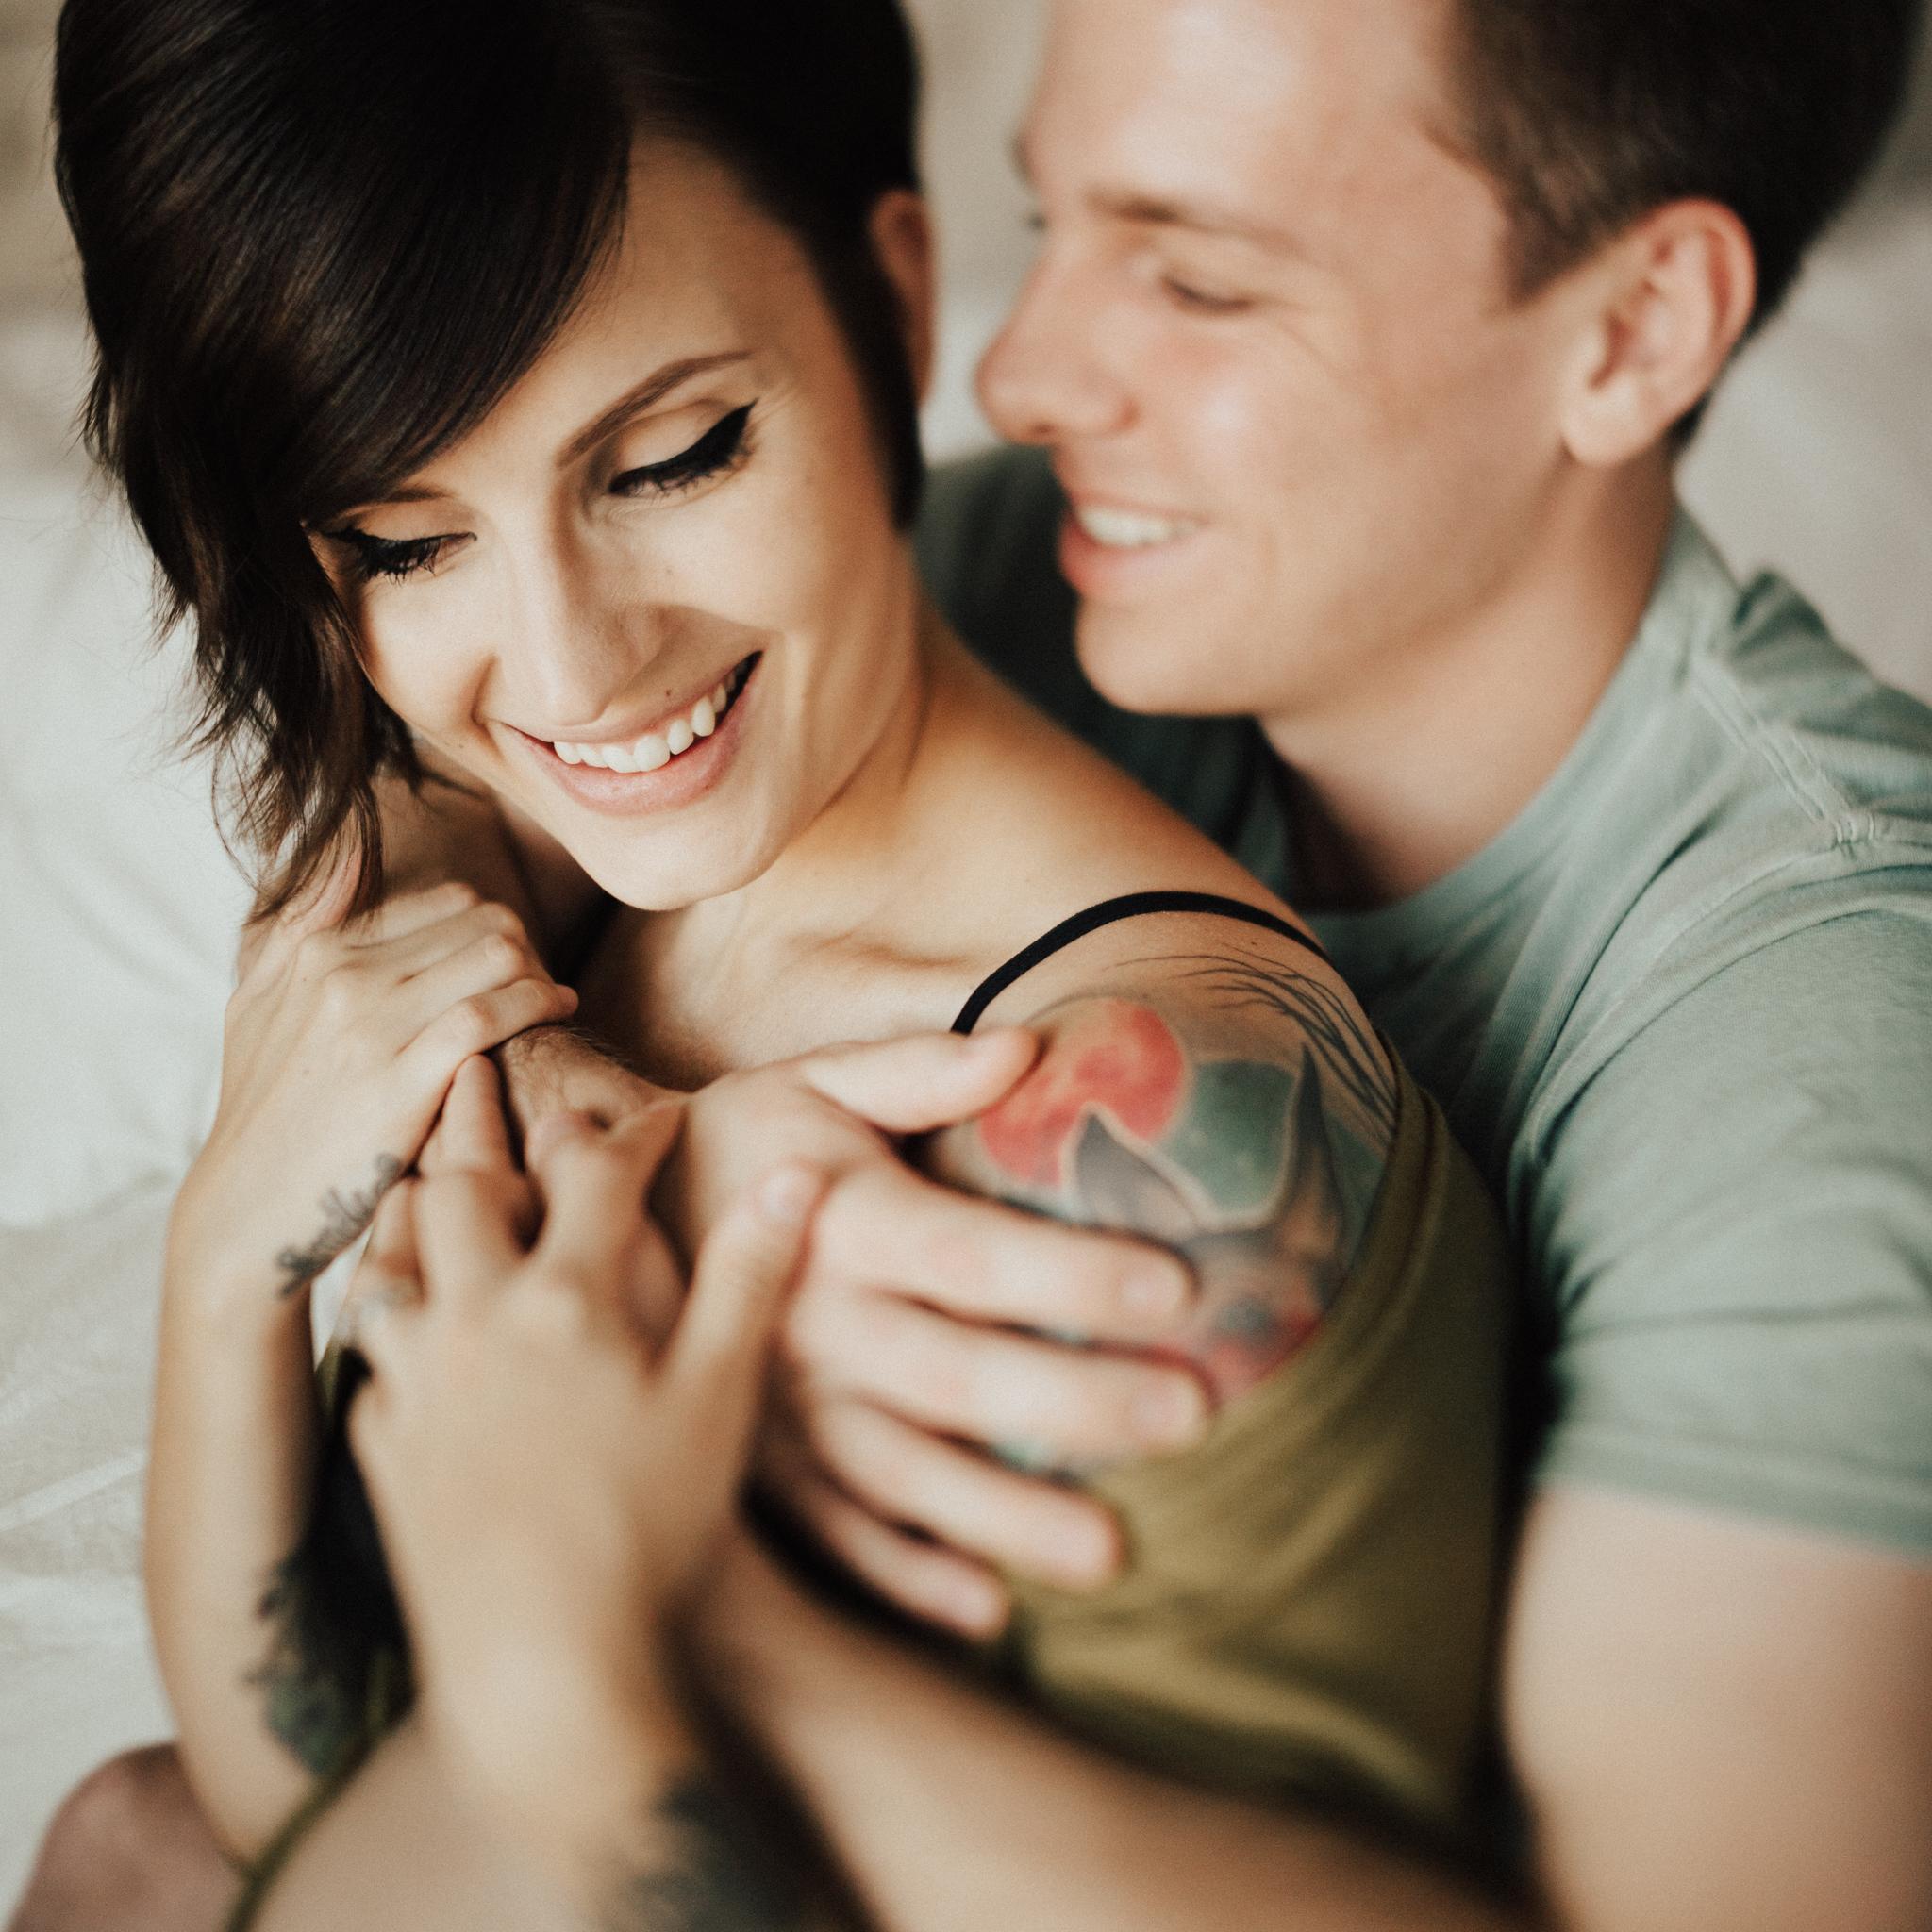 Arizona-Intimate-In-Home-Session-Maternity (13).jpg